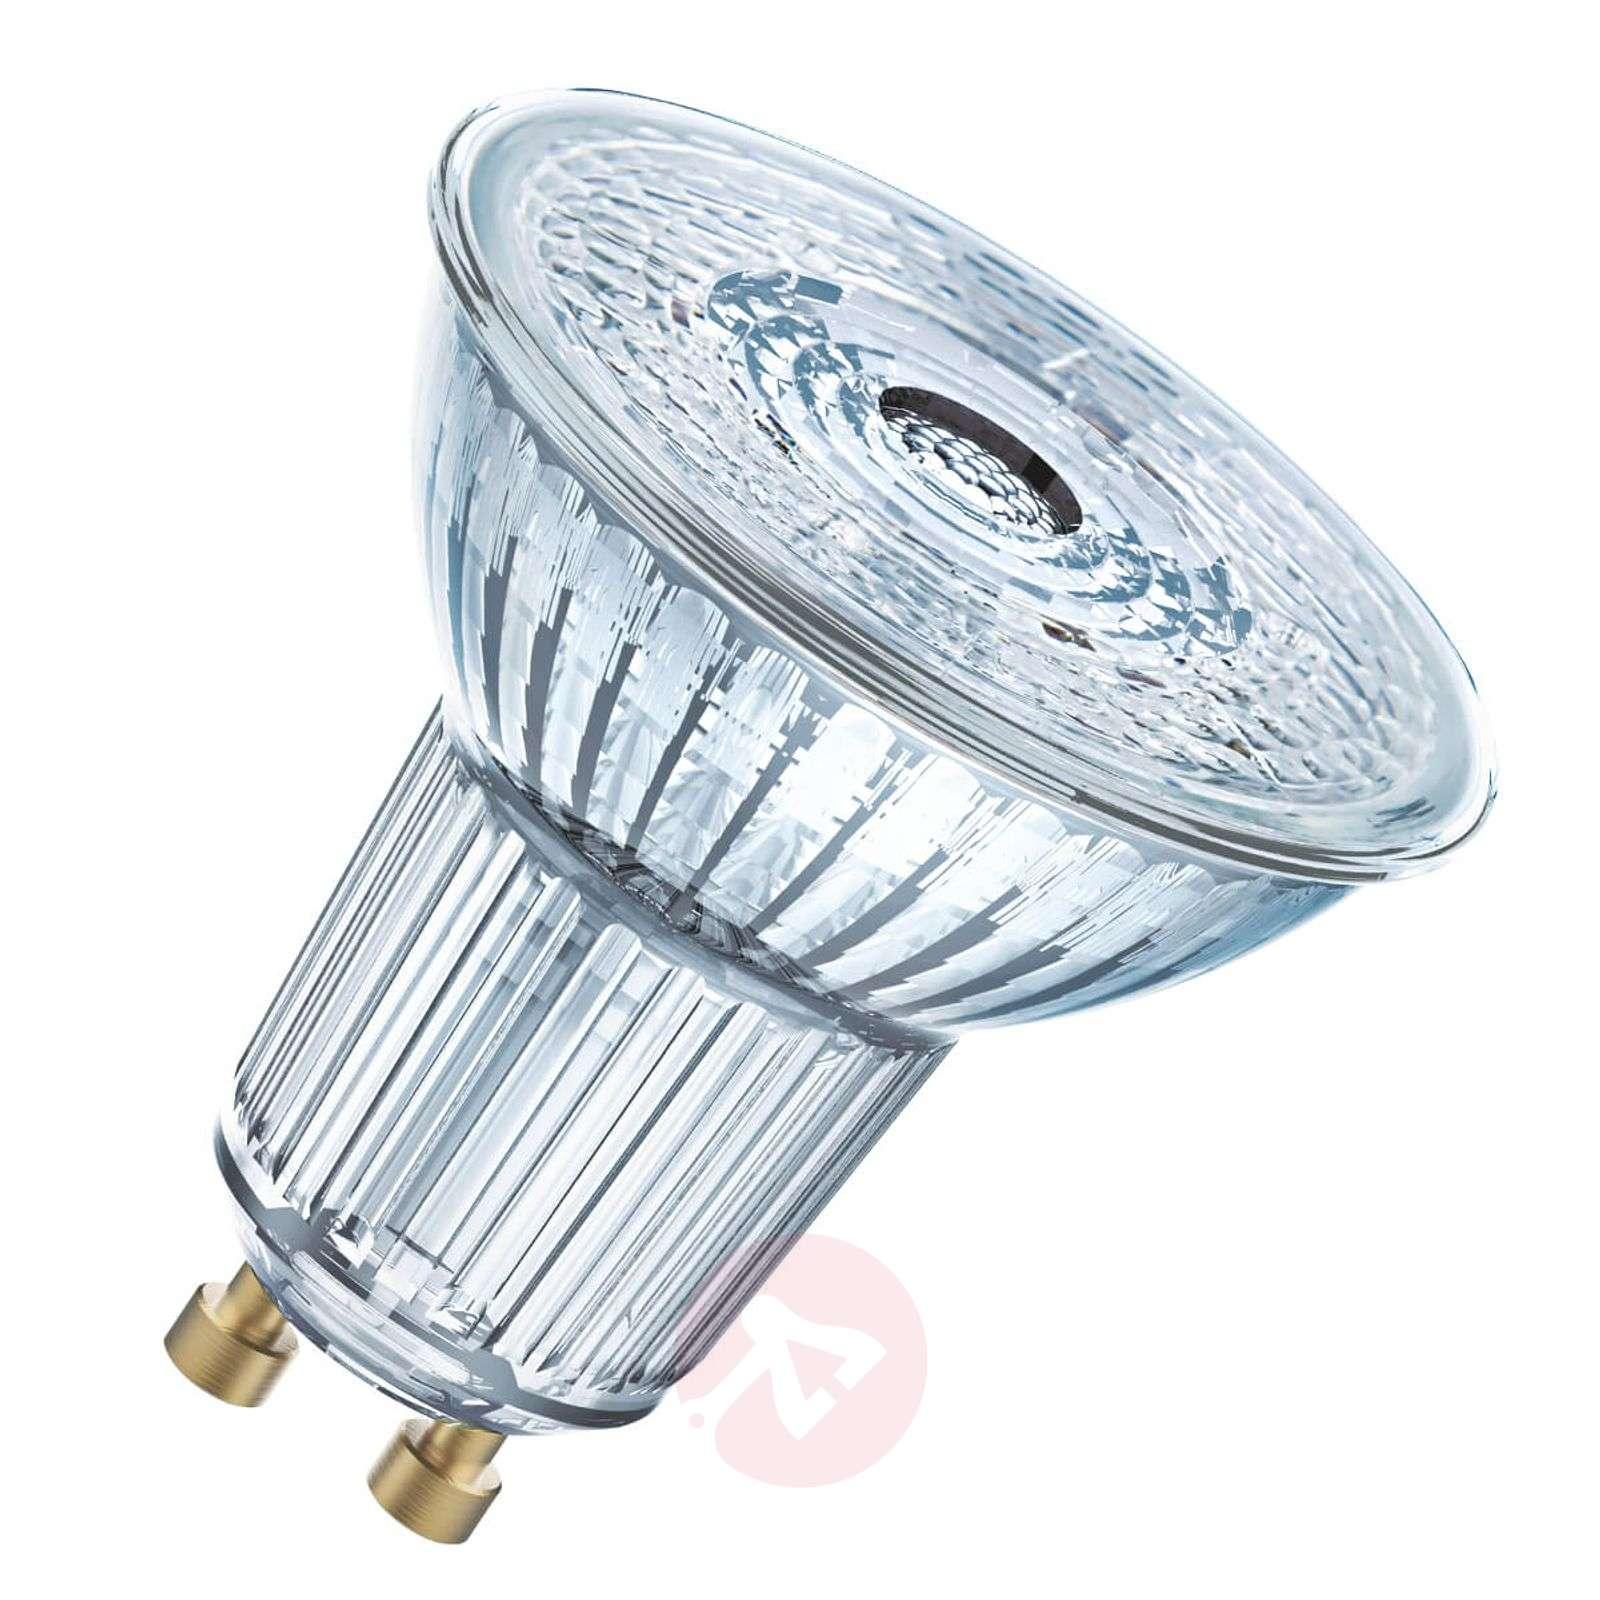 LED-heijastinlamppu GU10 3,6W, lämmin valk., 3 kpl-7262108-02